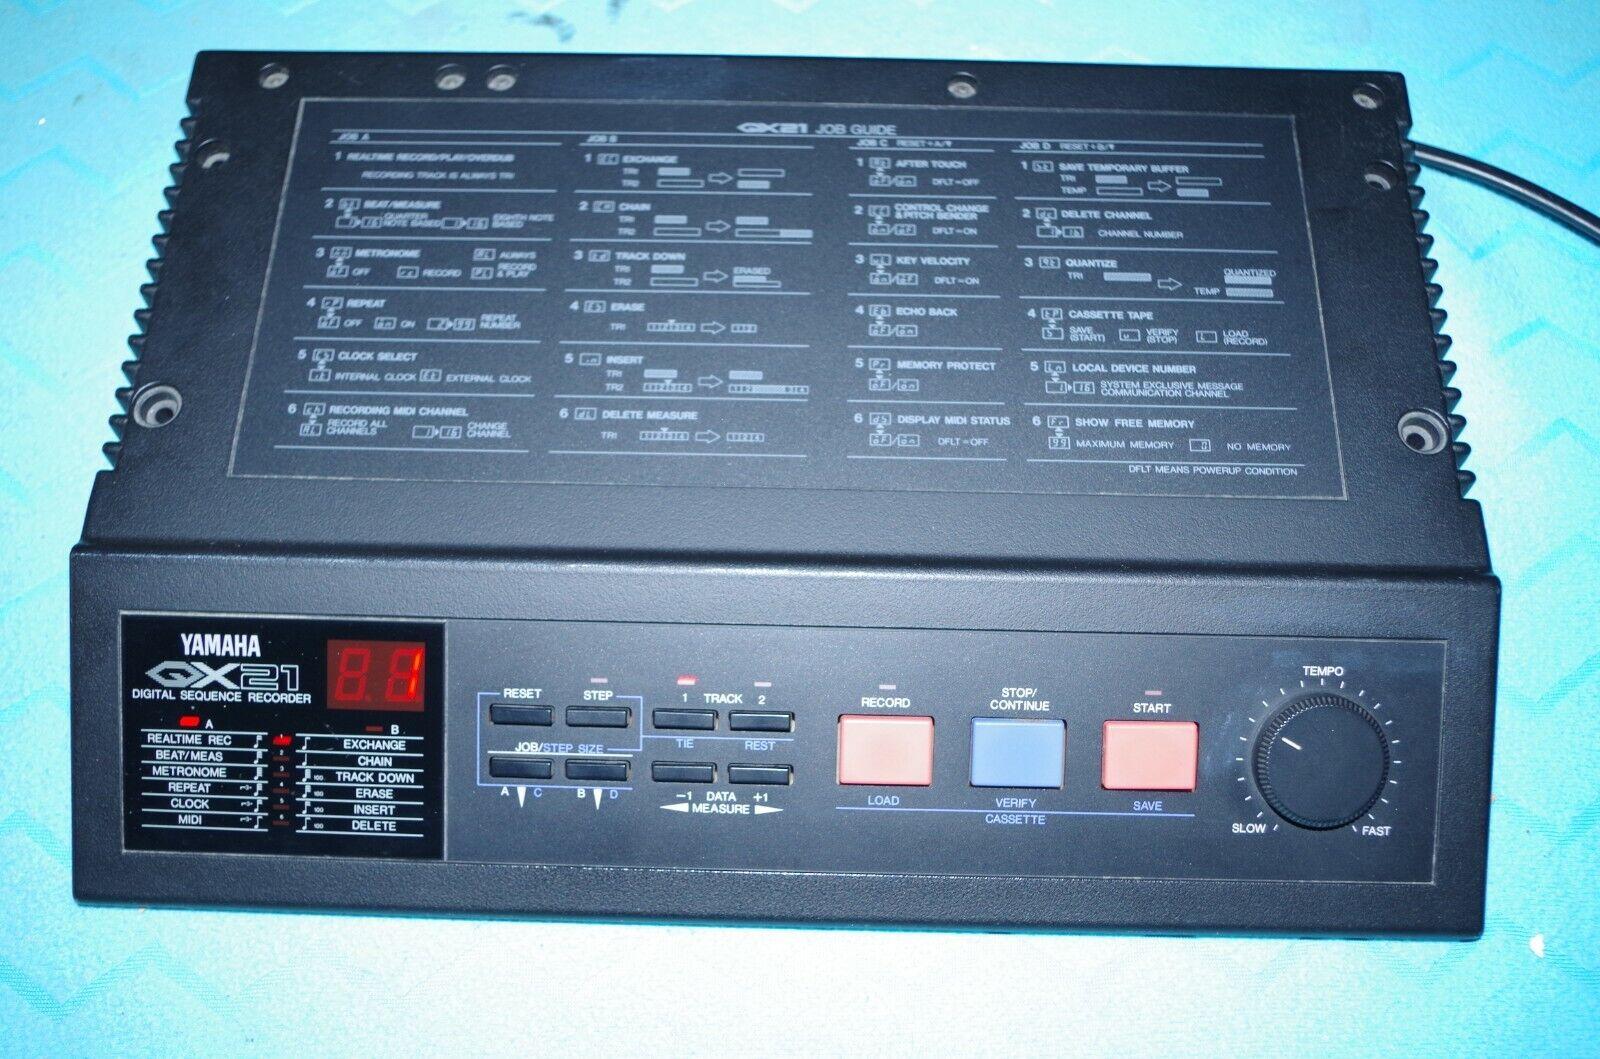 Yamaha QX 21 Step Recorder